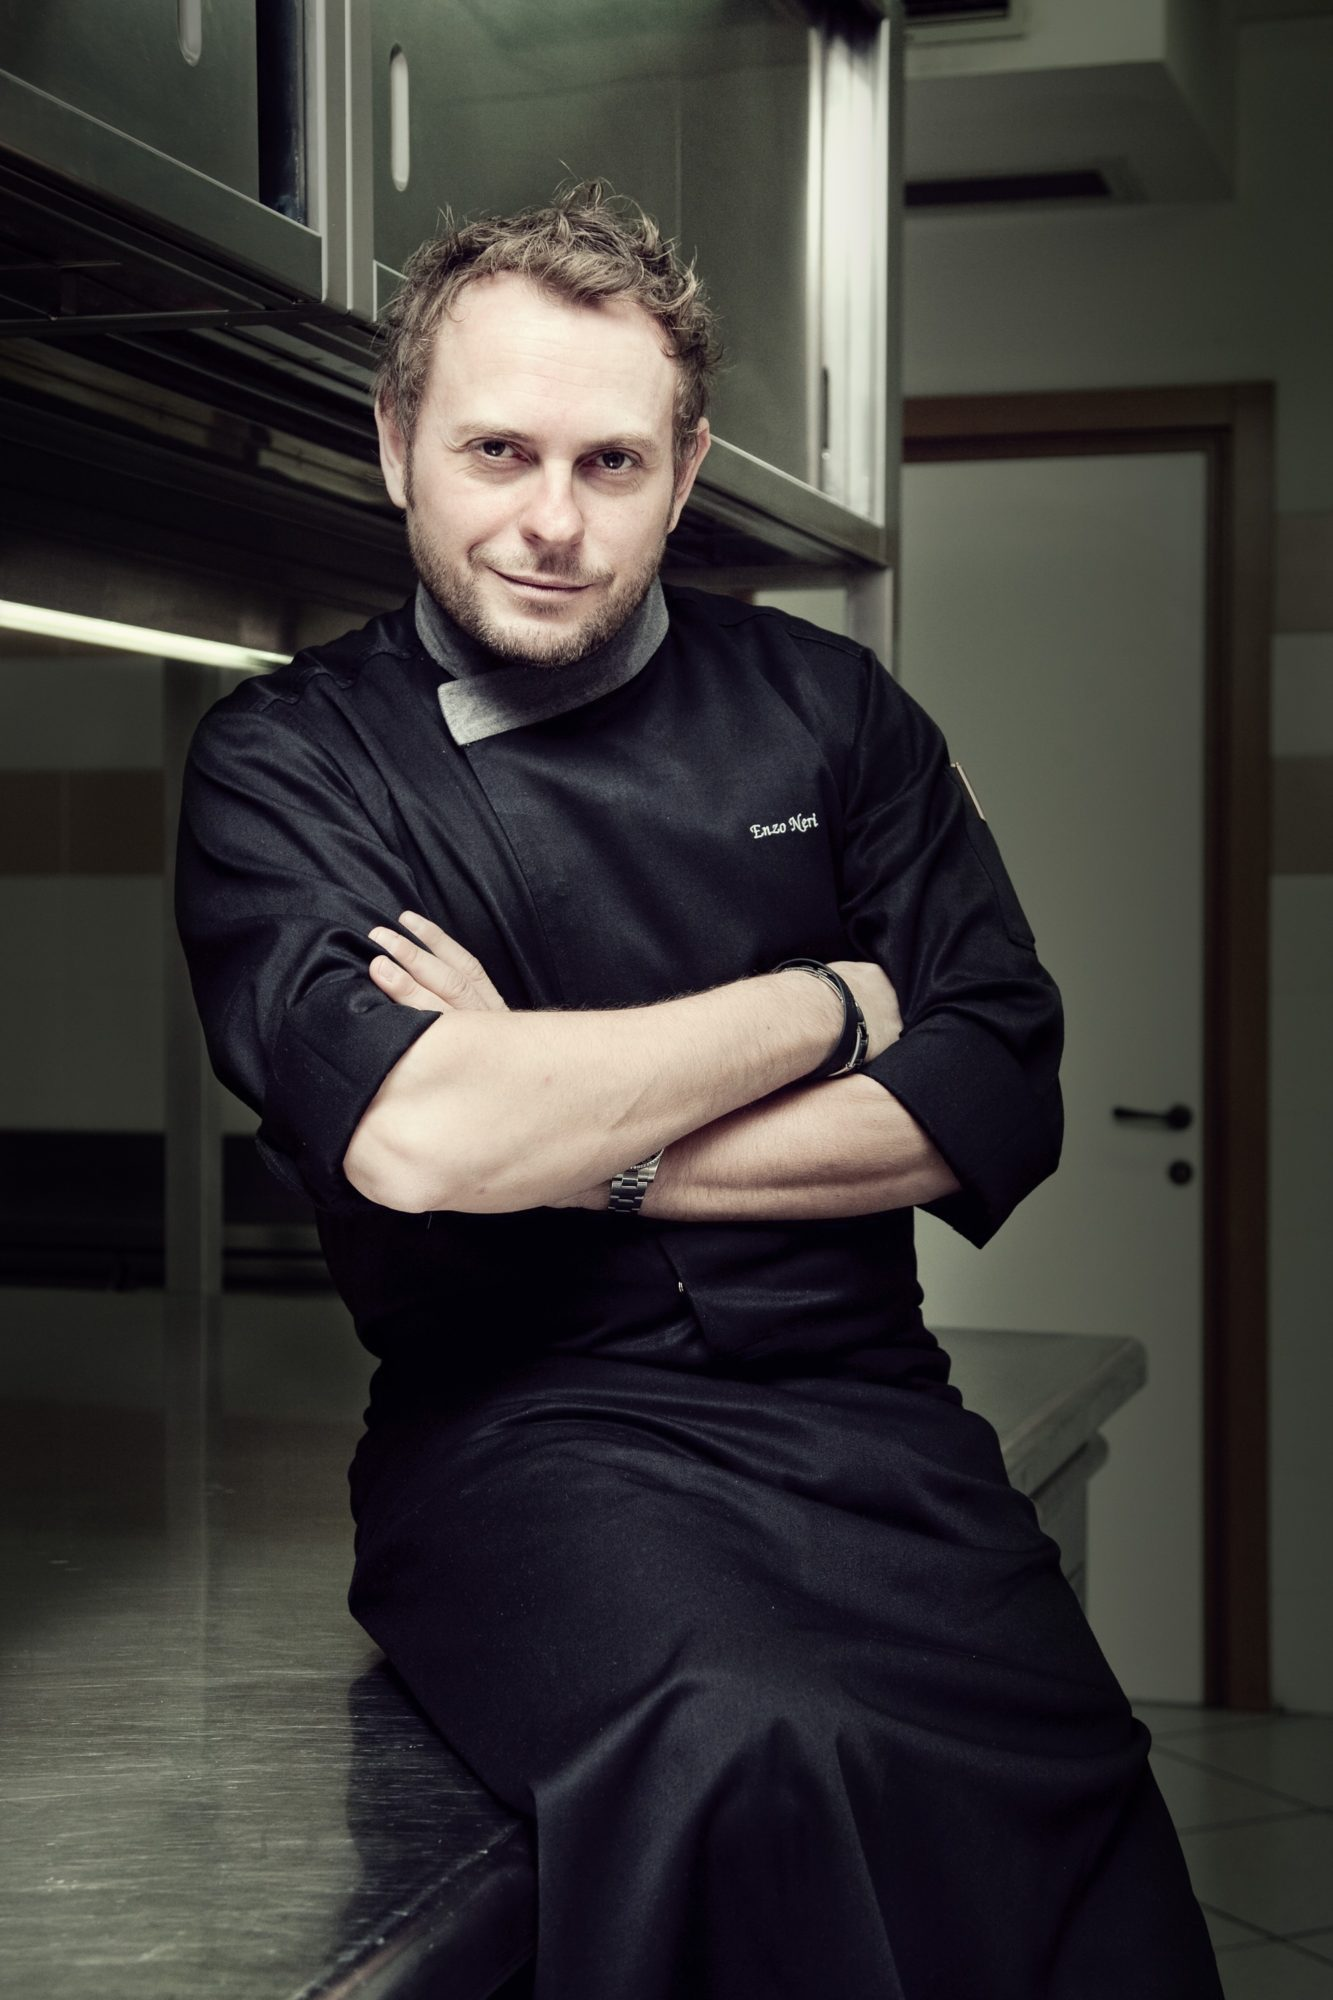 Enzo Neri - portrait